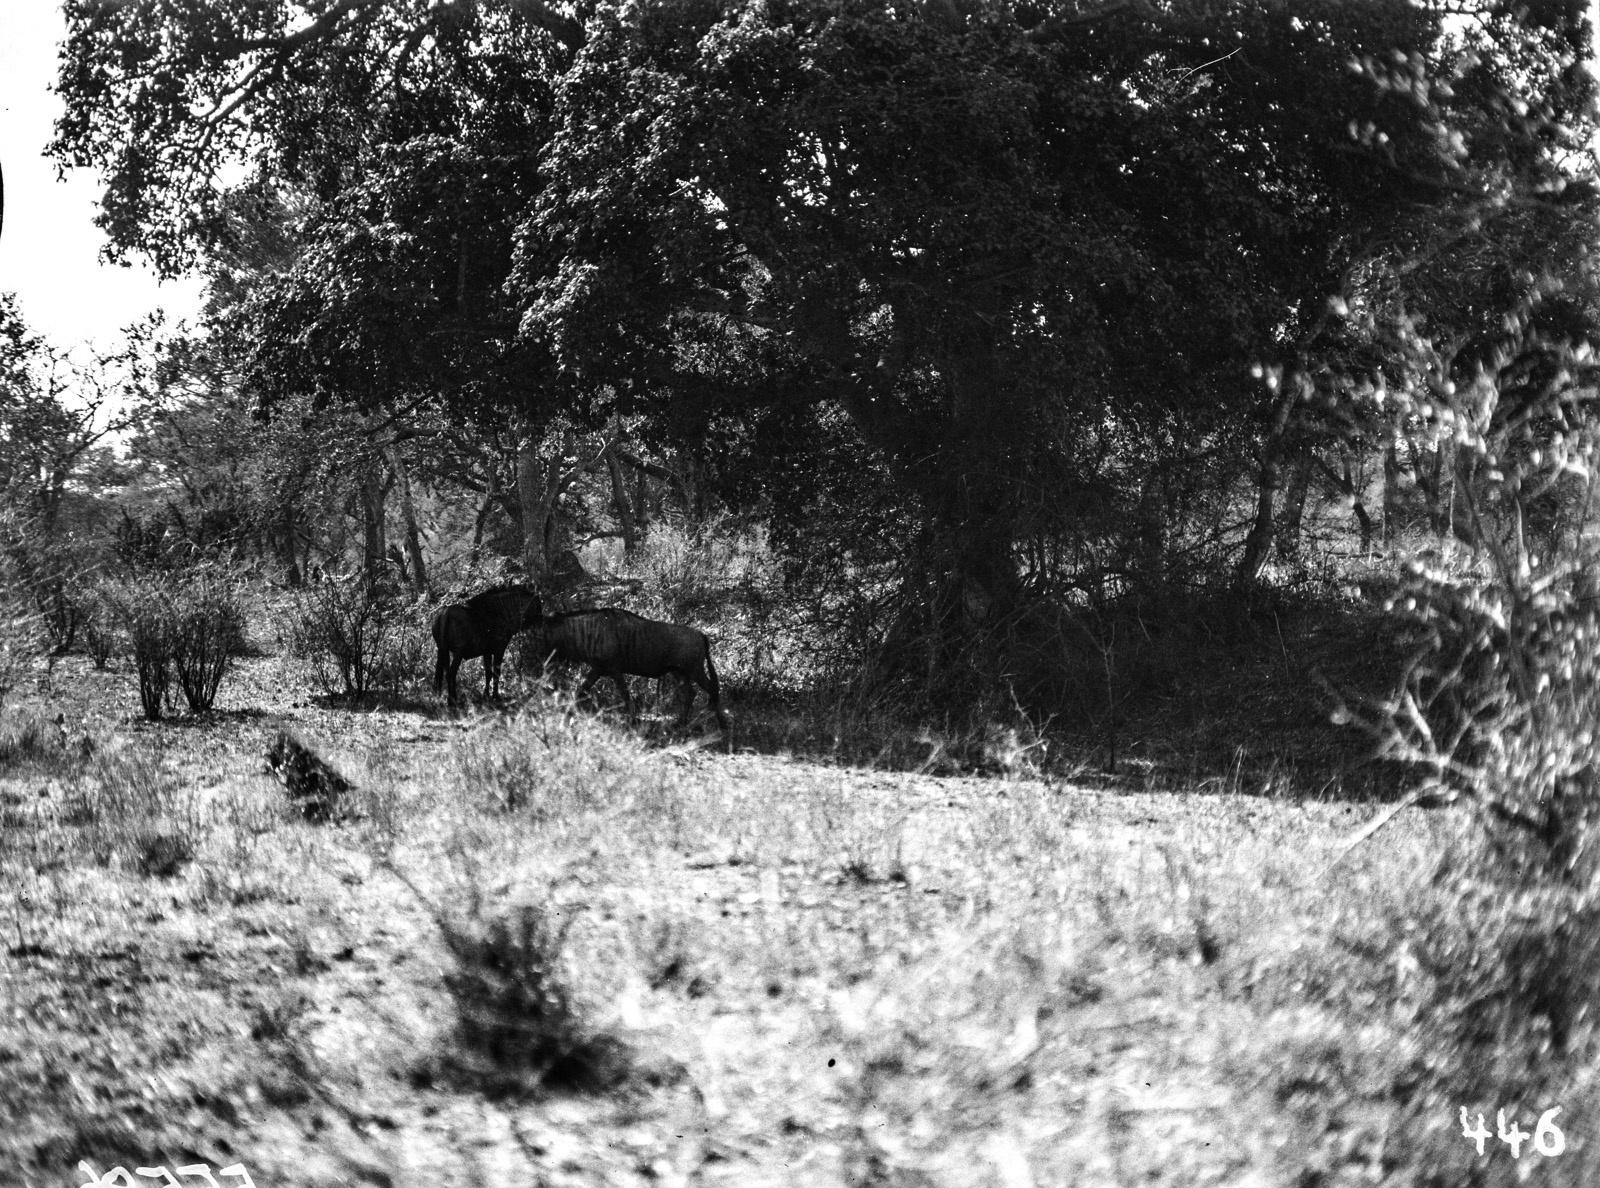 Национальный парк Крюгера. Гну ищут убежище от солнца в тени дерева